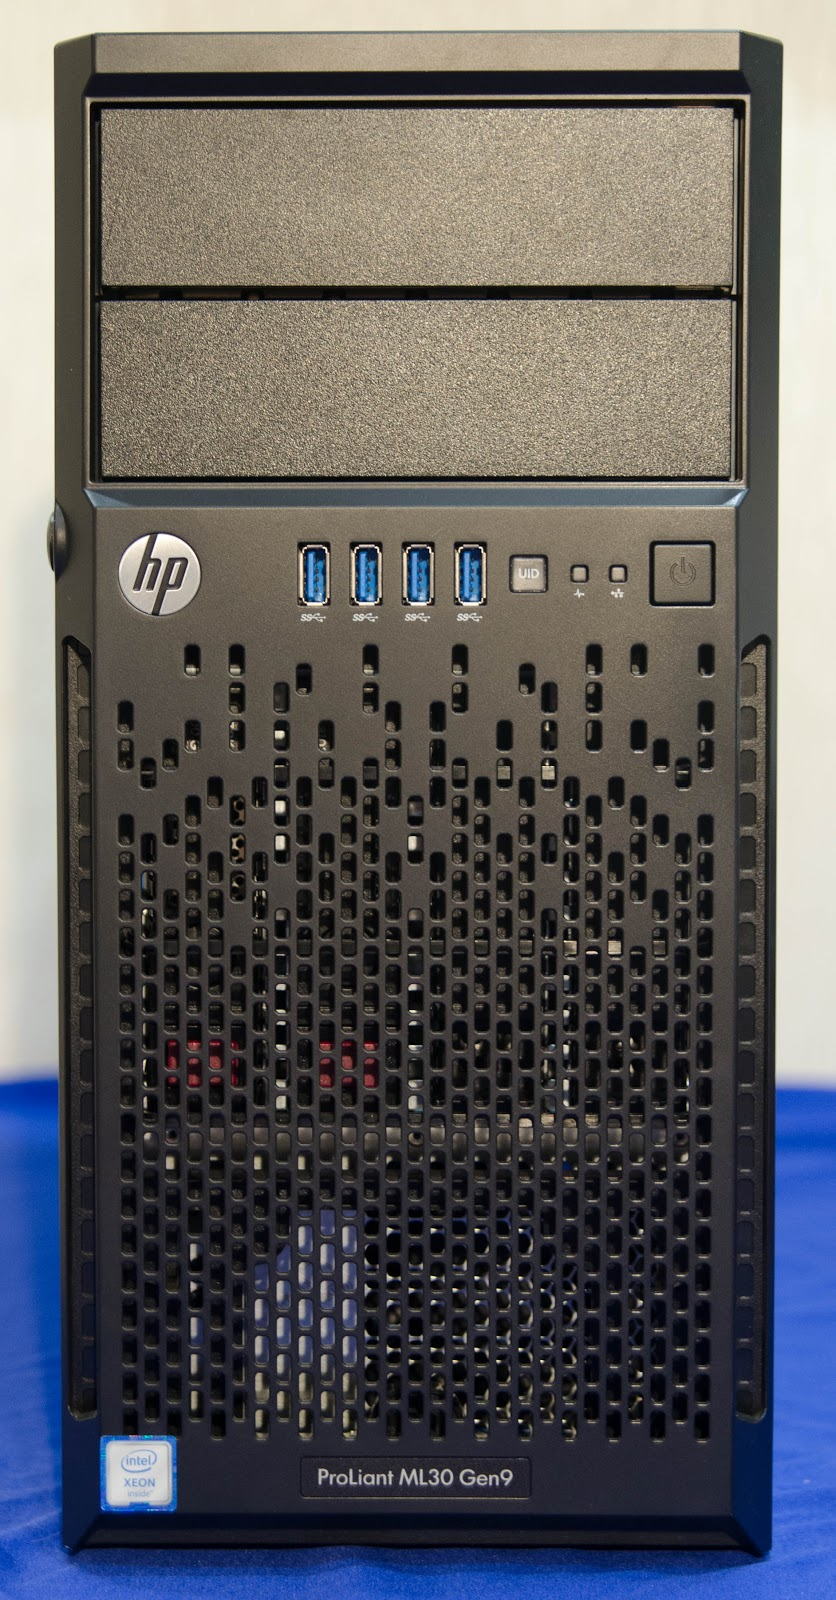 MаL, да удал: Обзор младших серверов линейки HPE ProLiant ML - 5